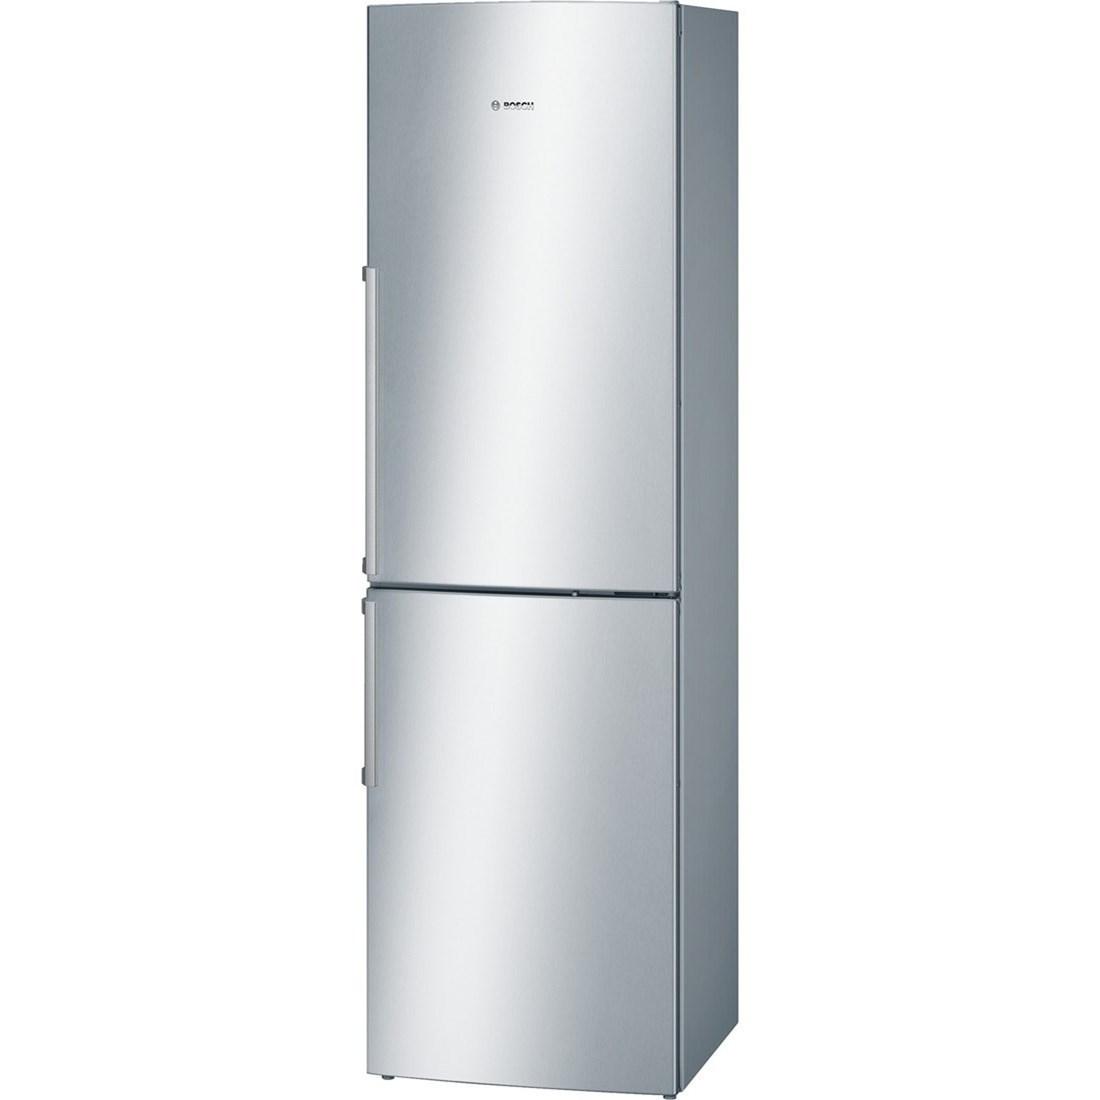 "Bosch Bottom-Freezer Refrigerators 24"" Counter-Depth Bottom-Freezer500 Series - Item Number: B11CB81SSS"